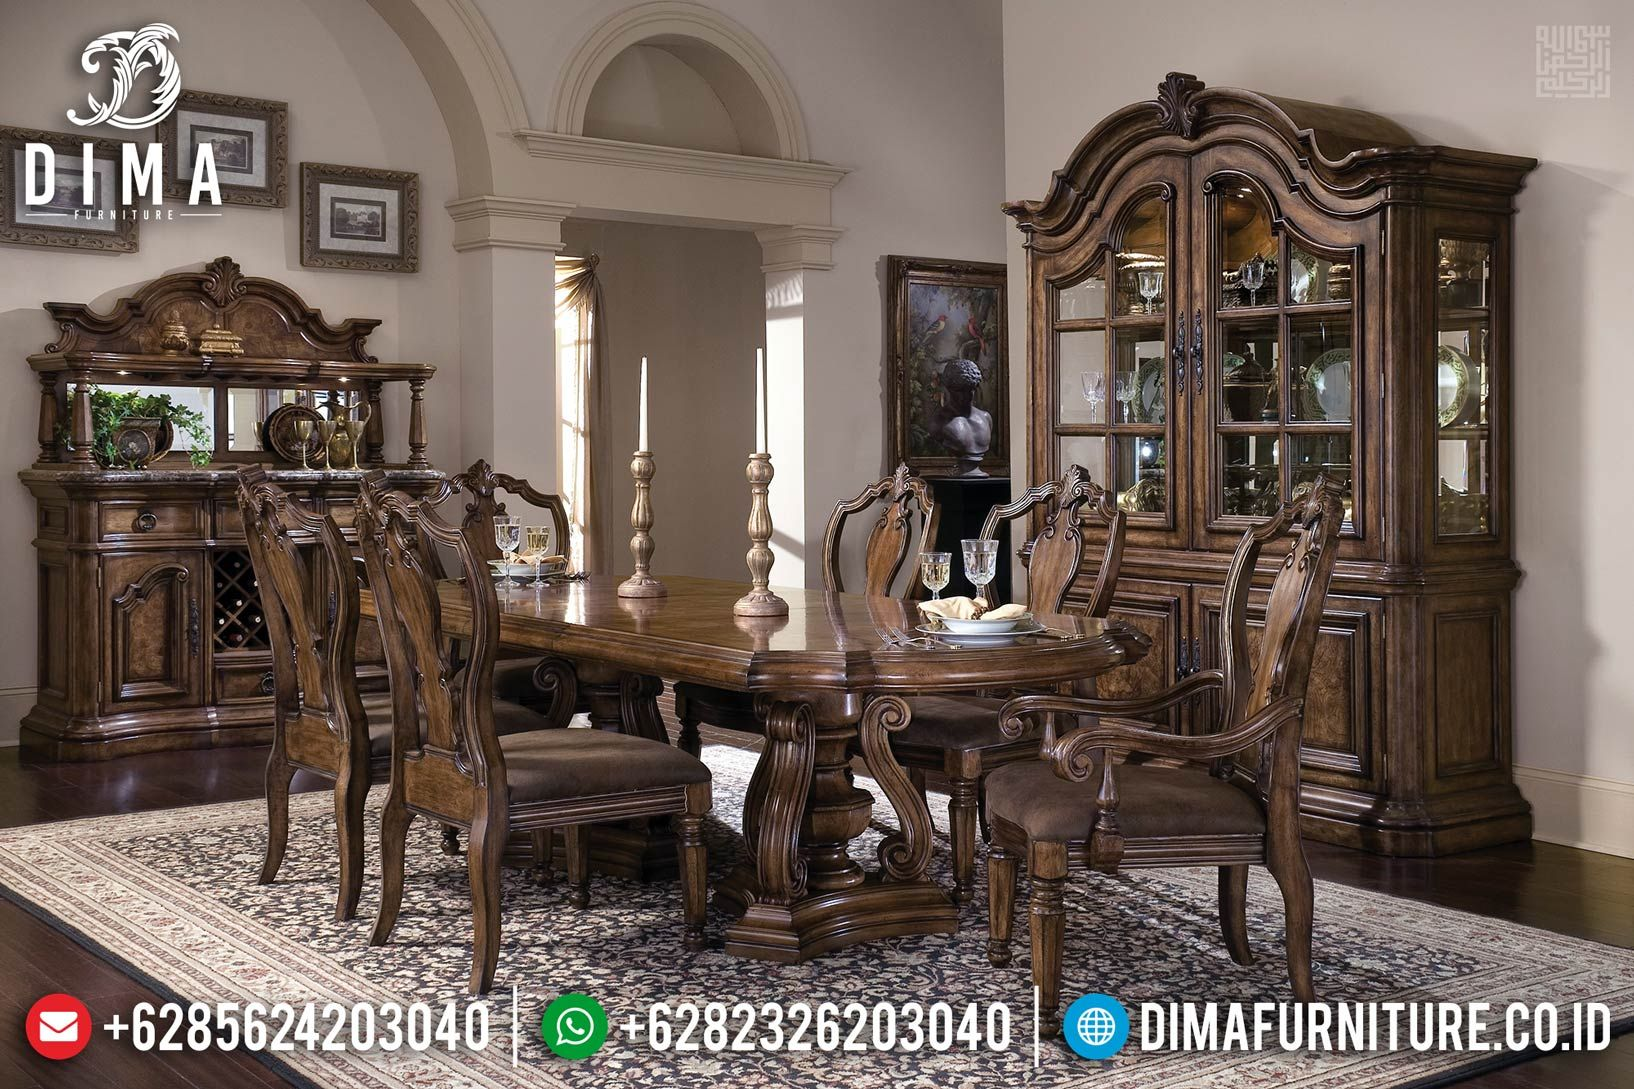 New Sale Meja Makan Jati Furniture Jepara Natural Pu Df 1185 Di